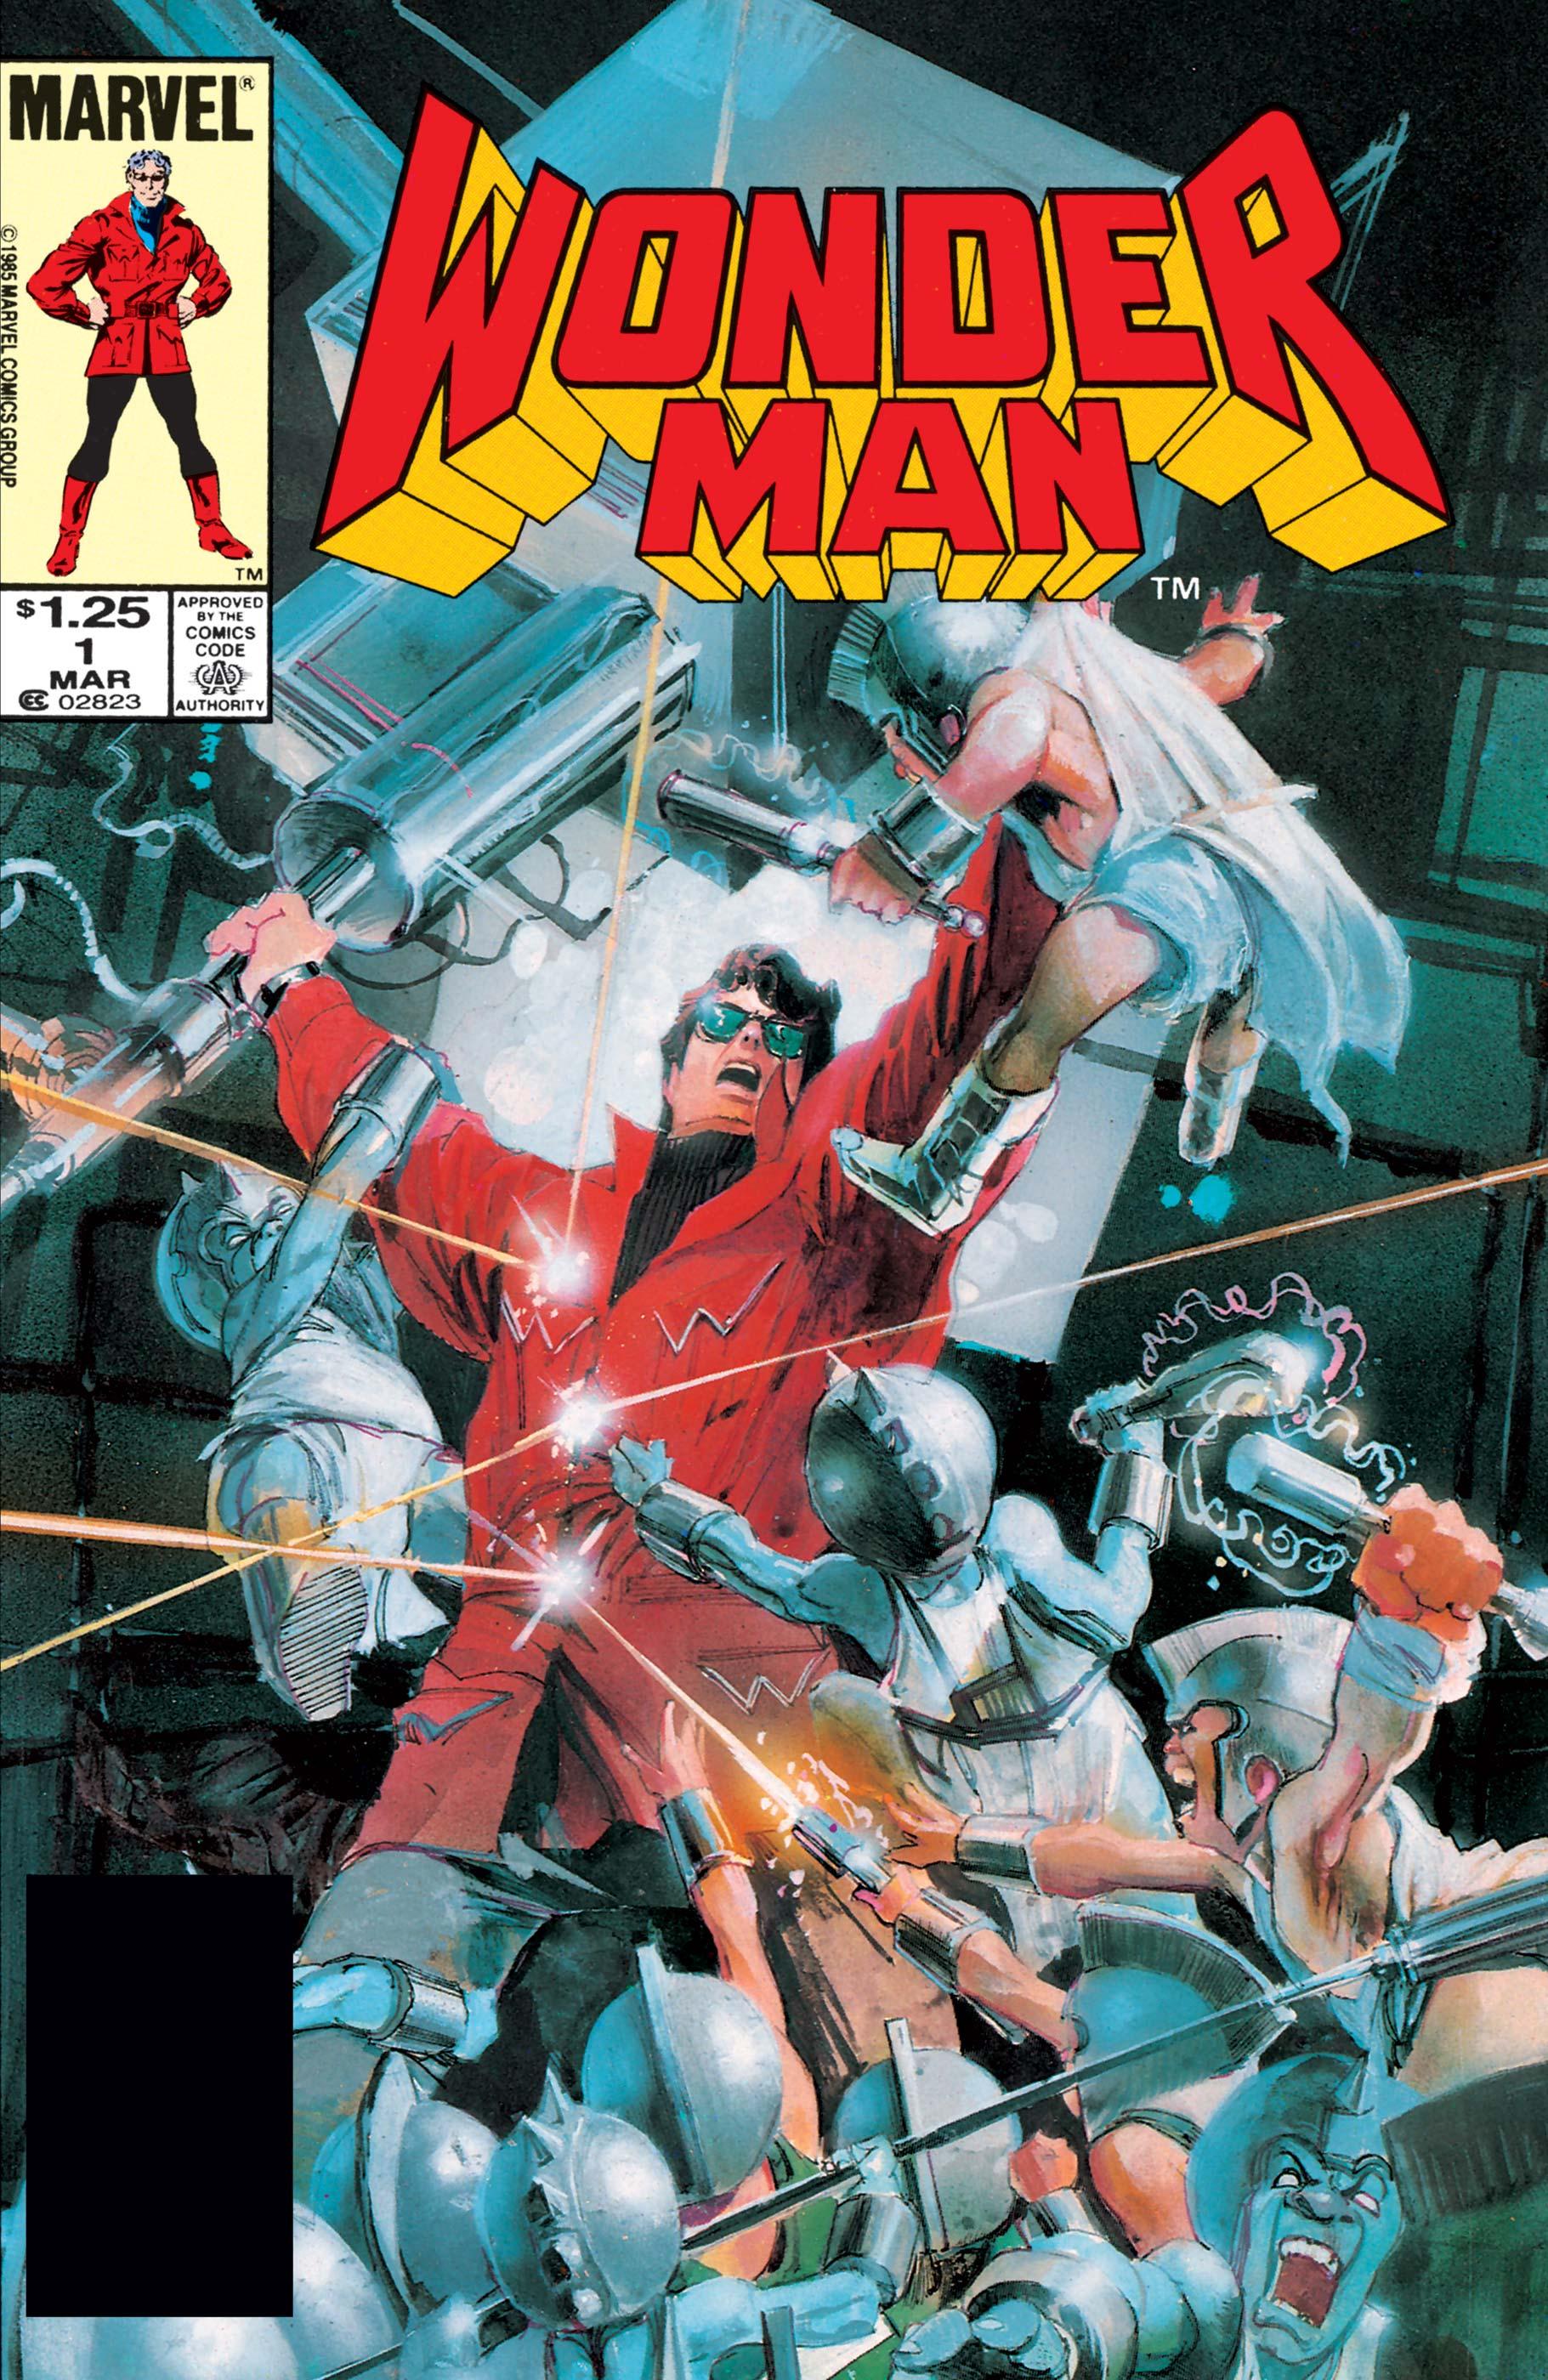 Wonder Man (1986) #1